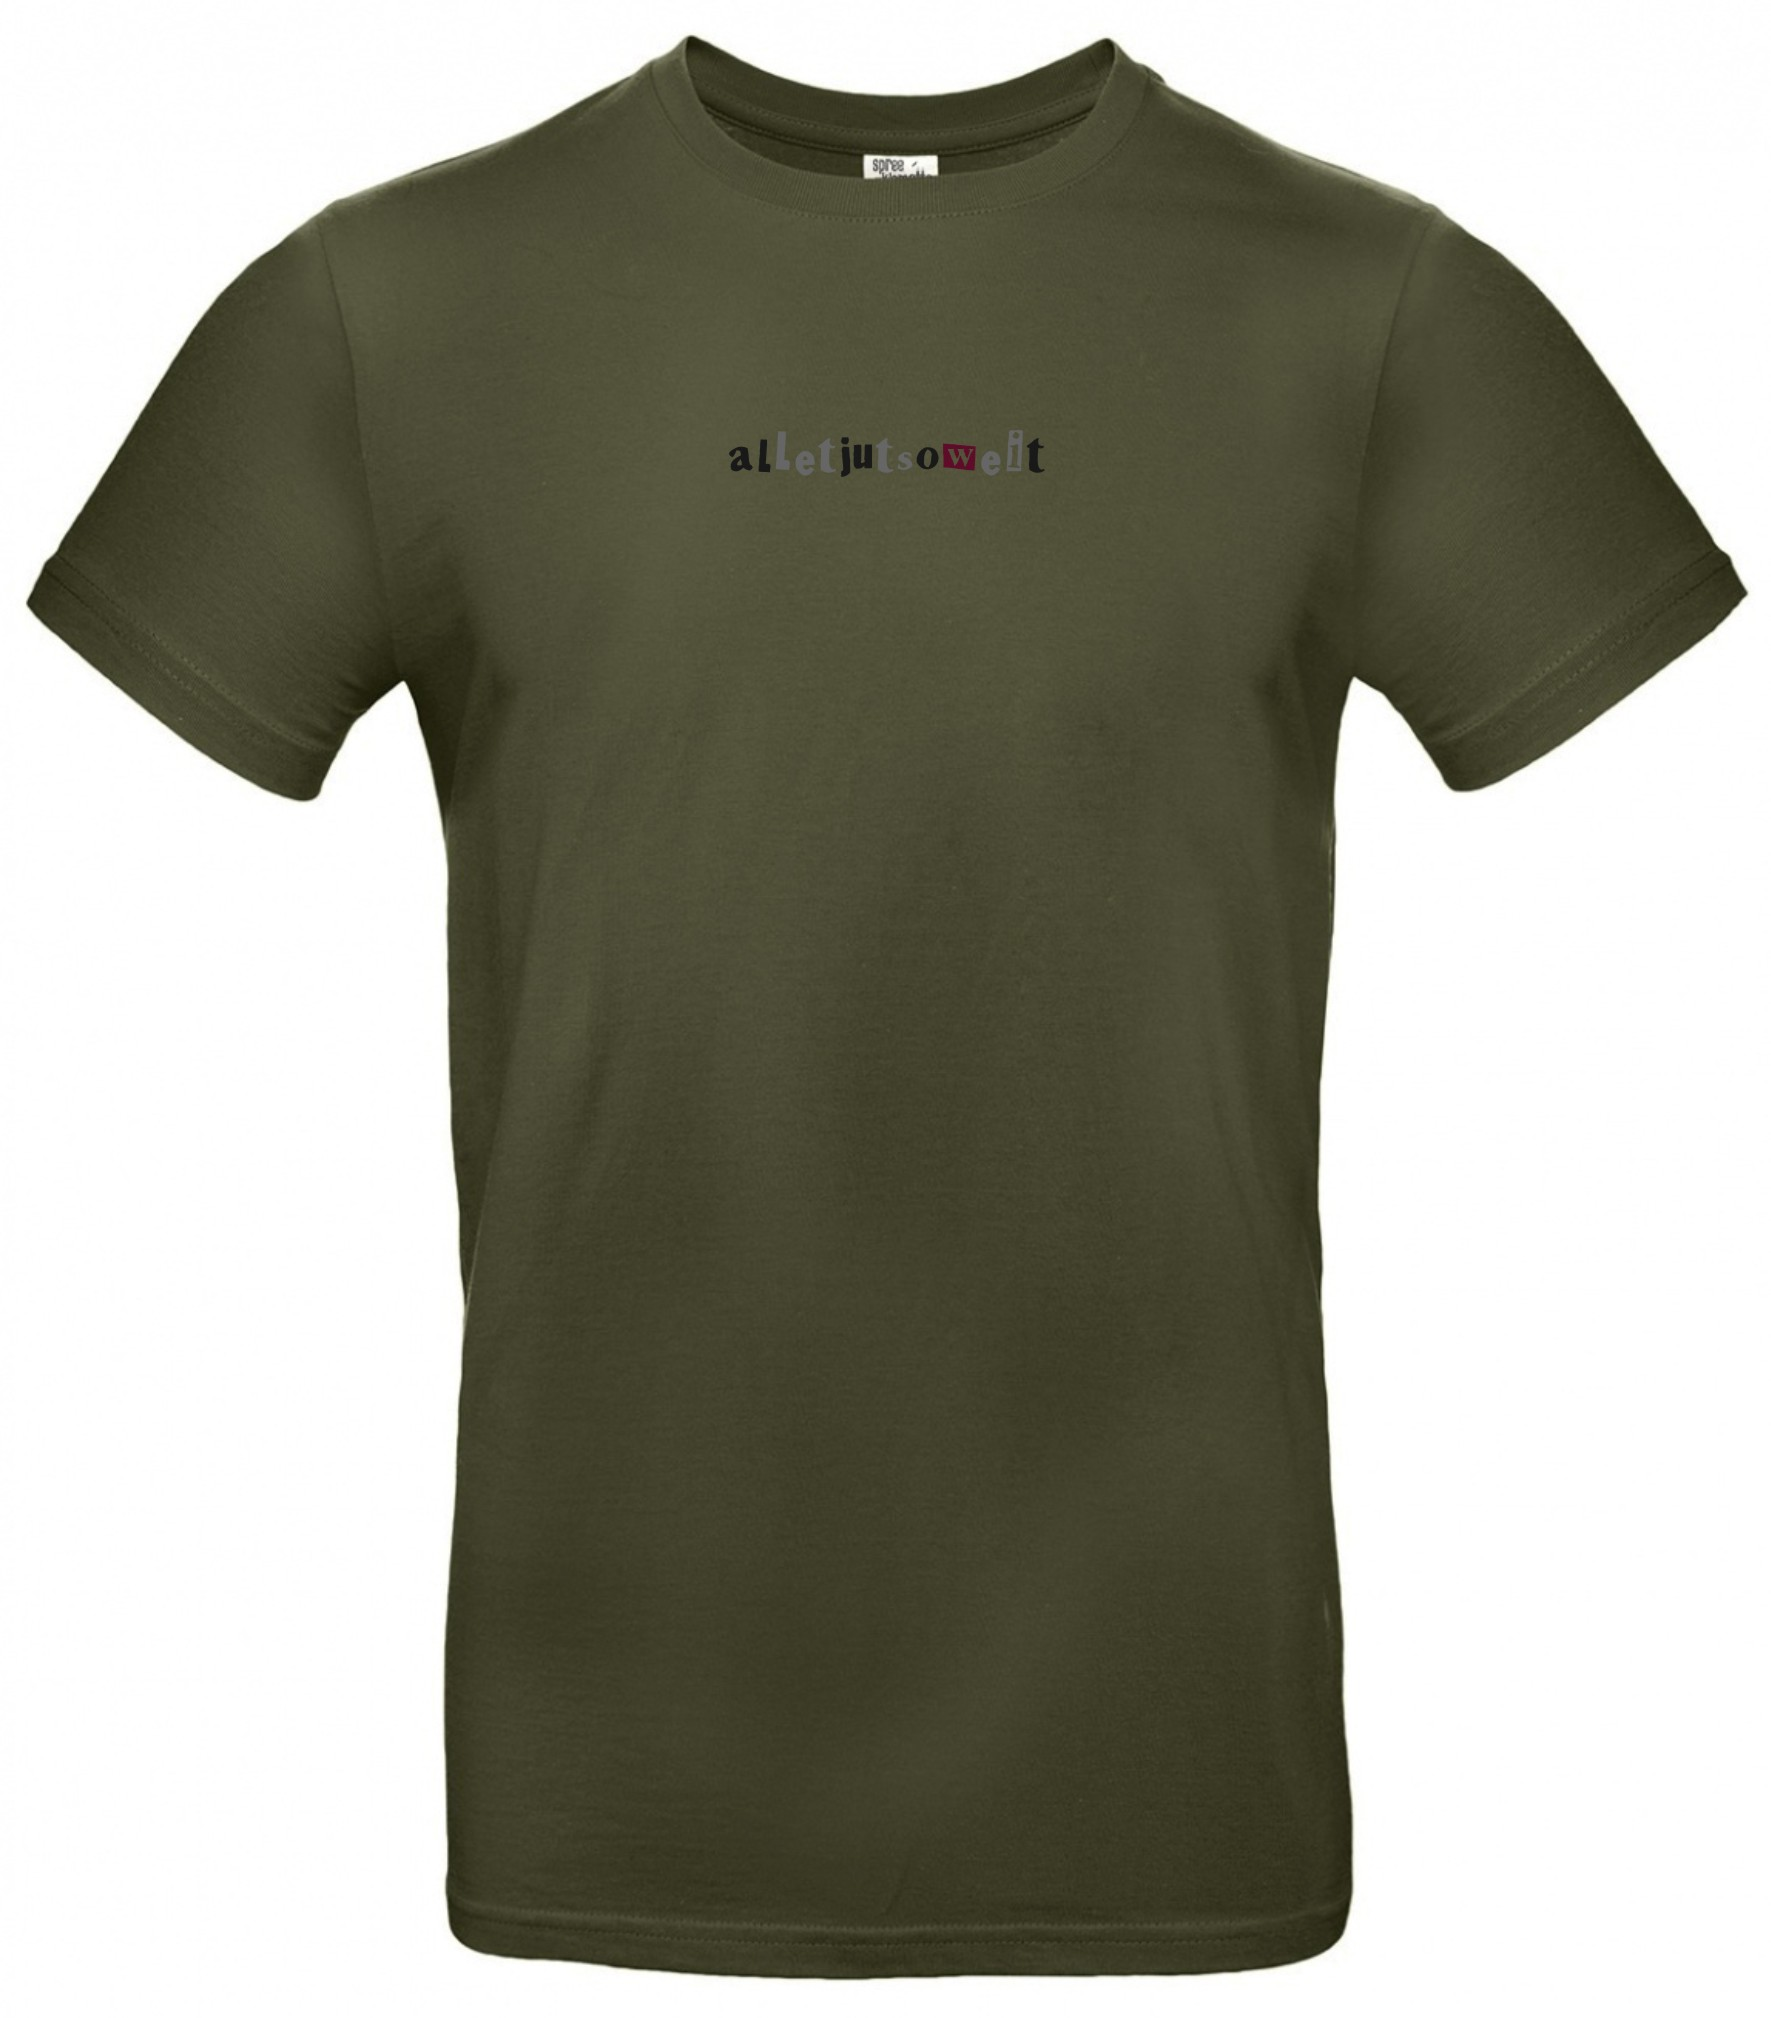 Spree Shirt Männer Allet jut soweit oliv